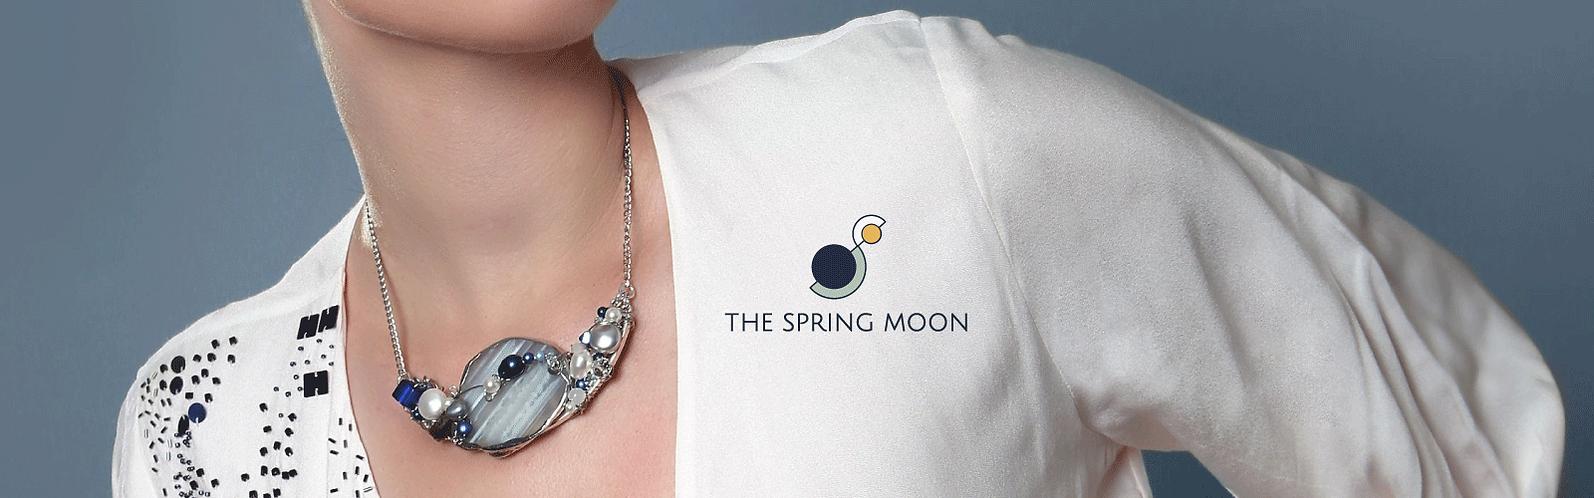 the spring moon brand identity